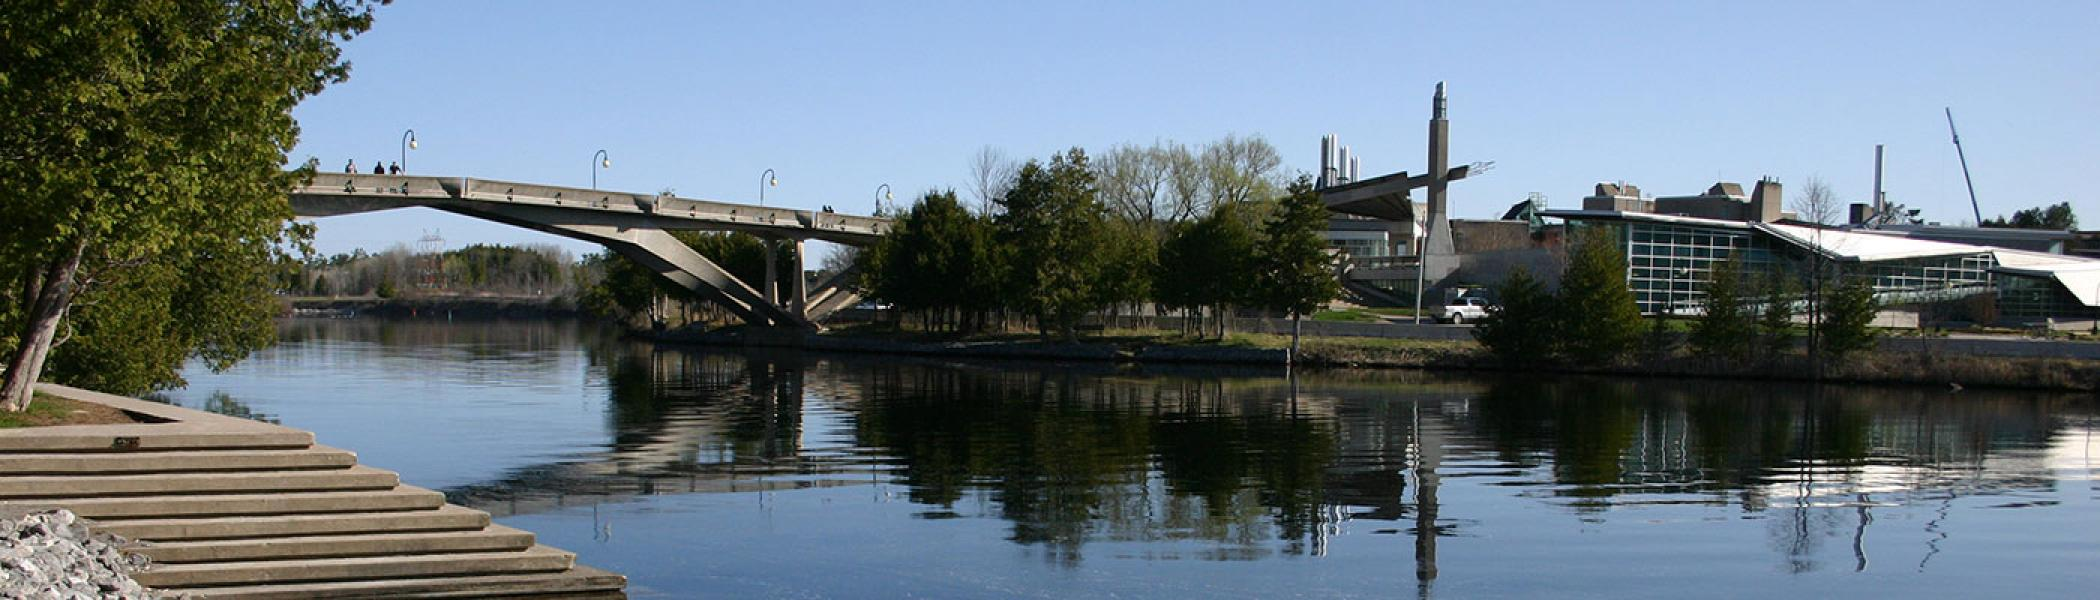 Faryon Bridge over the Otonabee River, Symons Campus